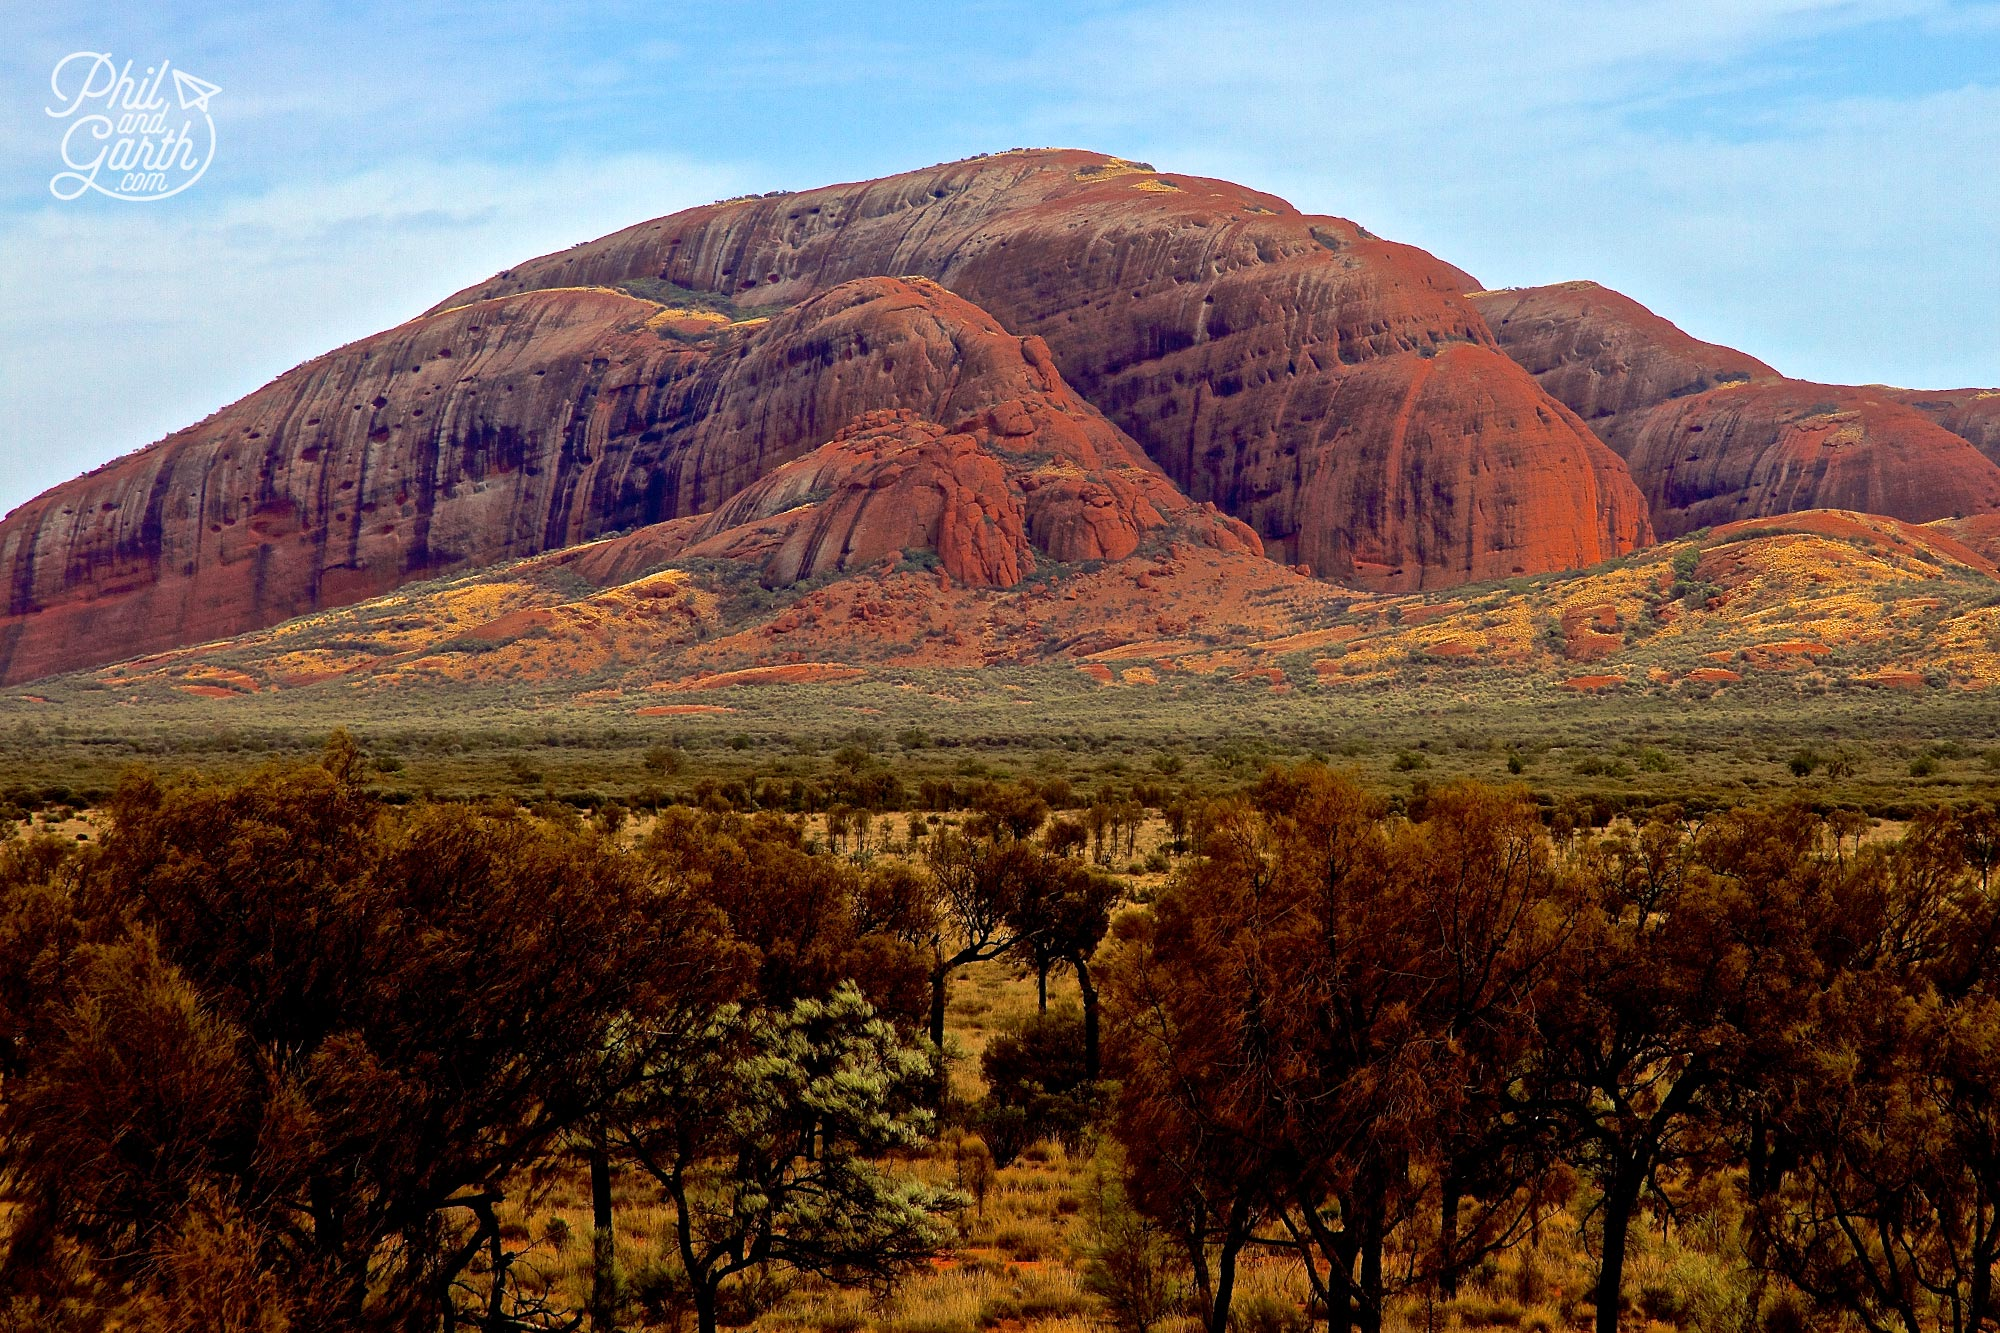 Kata Tjuta is equally as impressive as Uluru